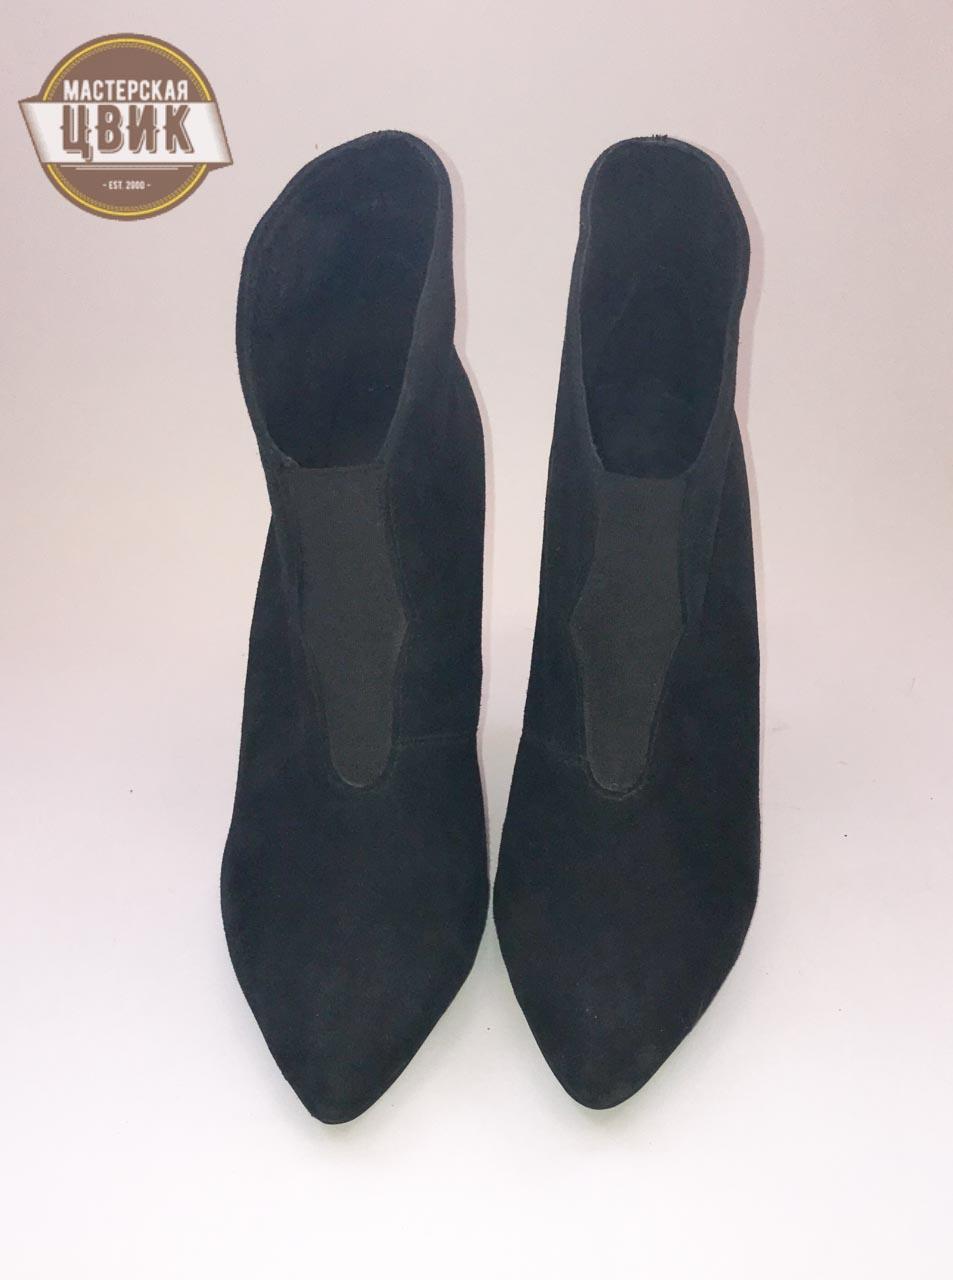 individualnyj-poshiv-obuvi-minsk-47 Индивидуальный пошив обуви